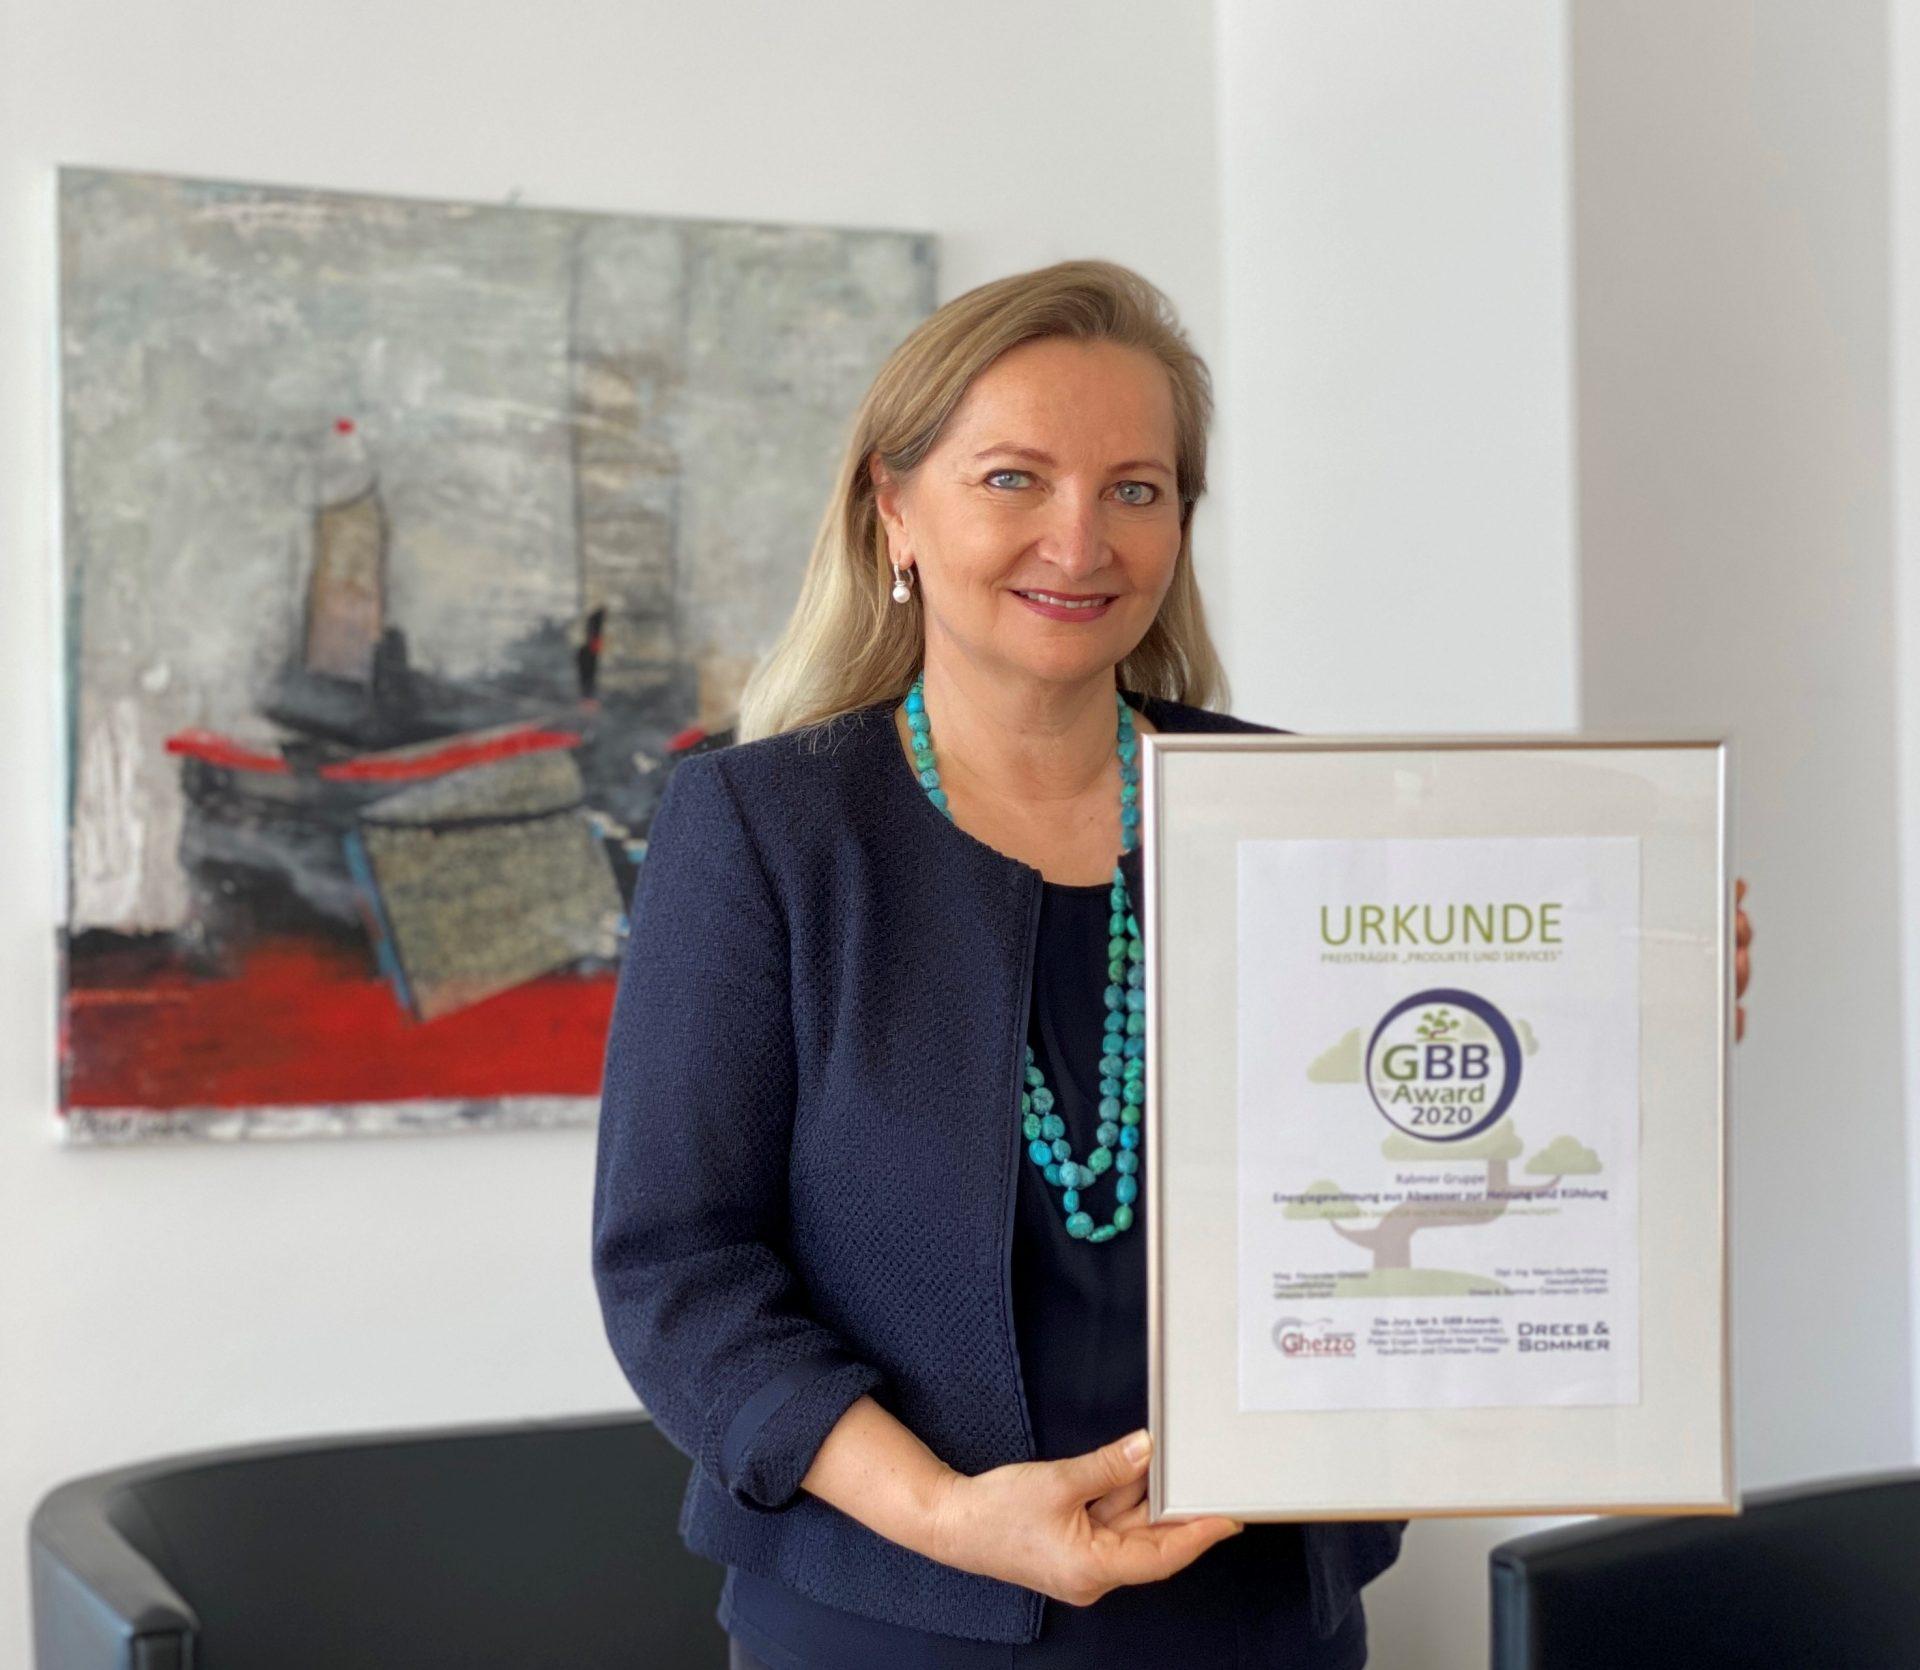 GBB Award: Rabmer wins sustainability award